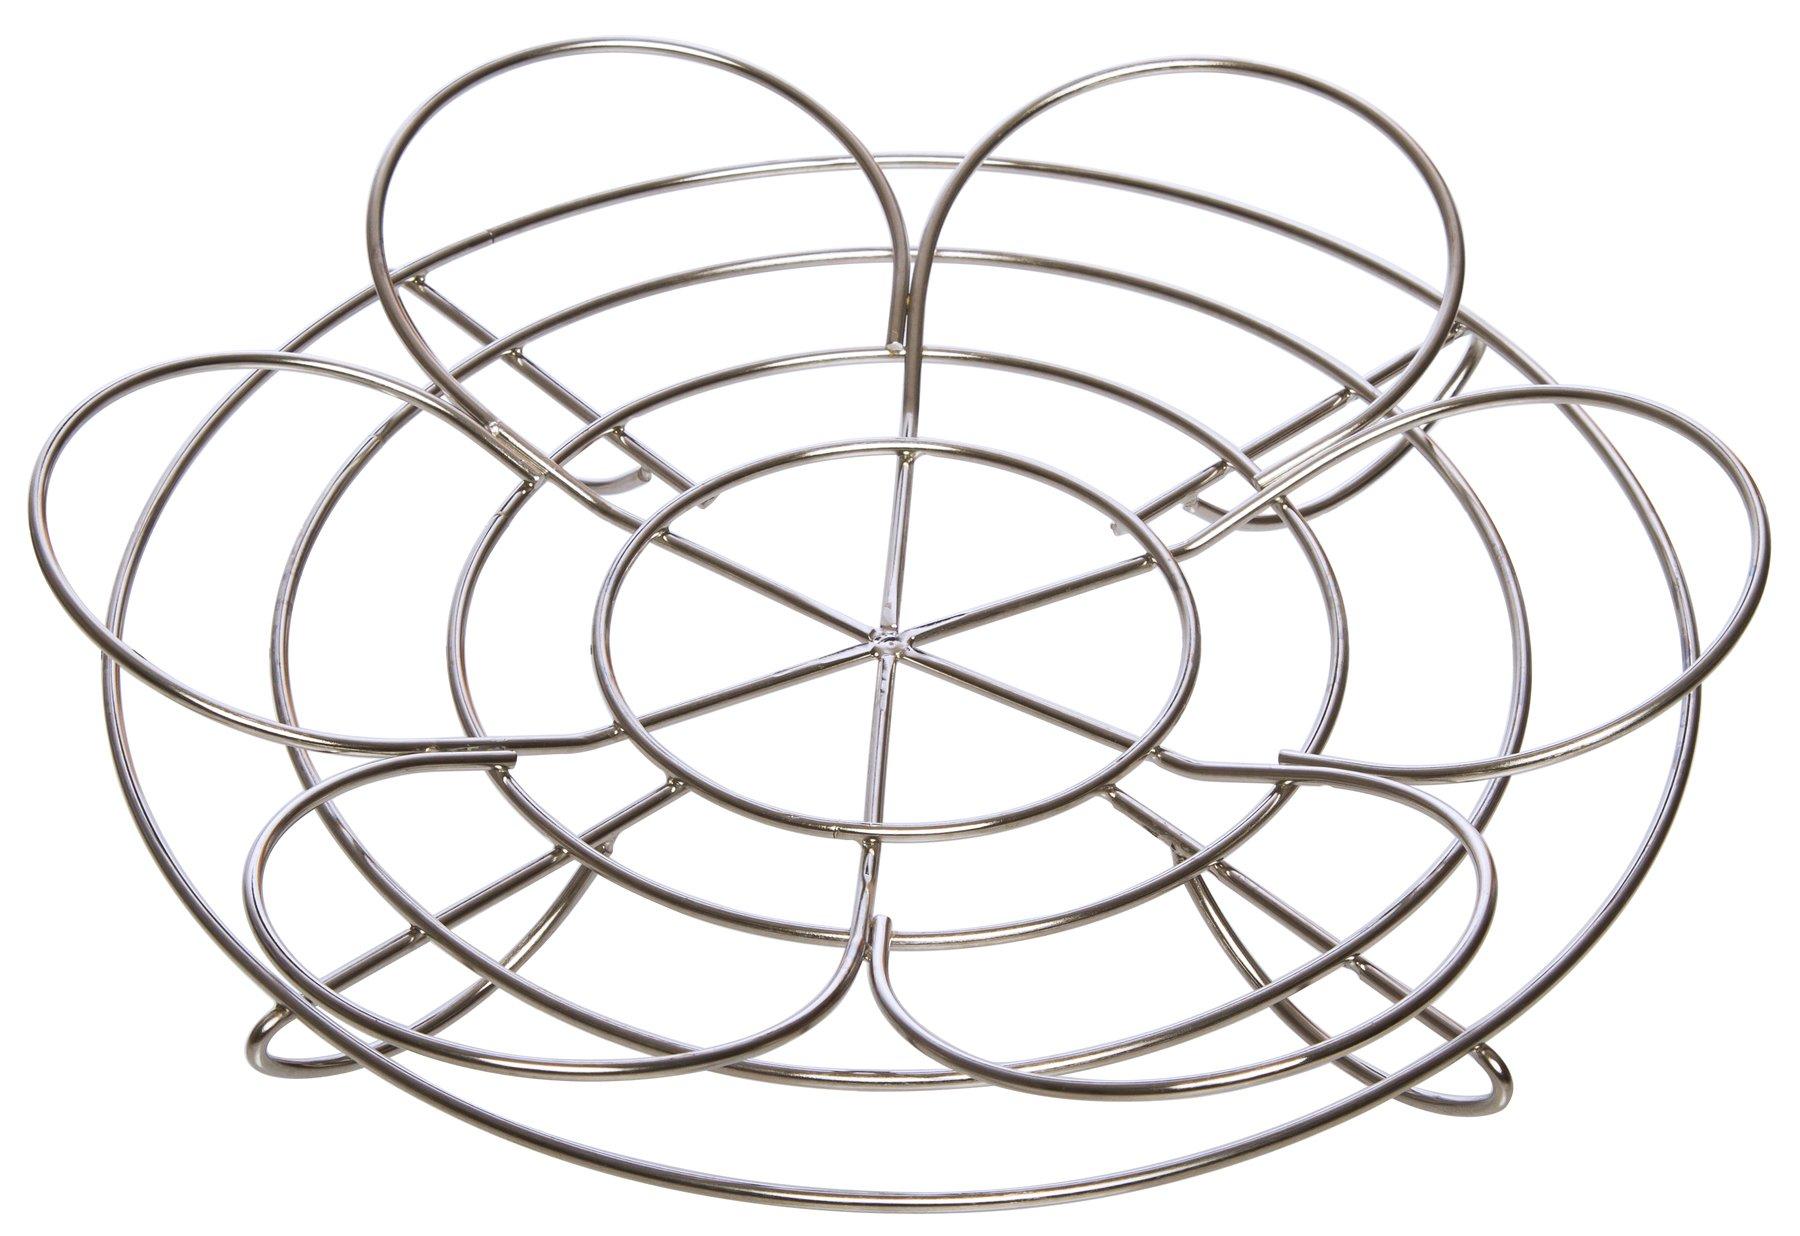 Prepworks by Progressive Reversible Stainless Steel Canning Rack by Progressive